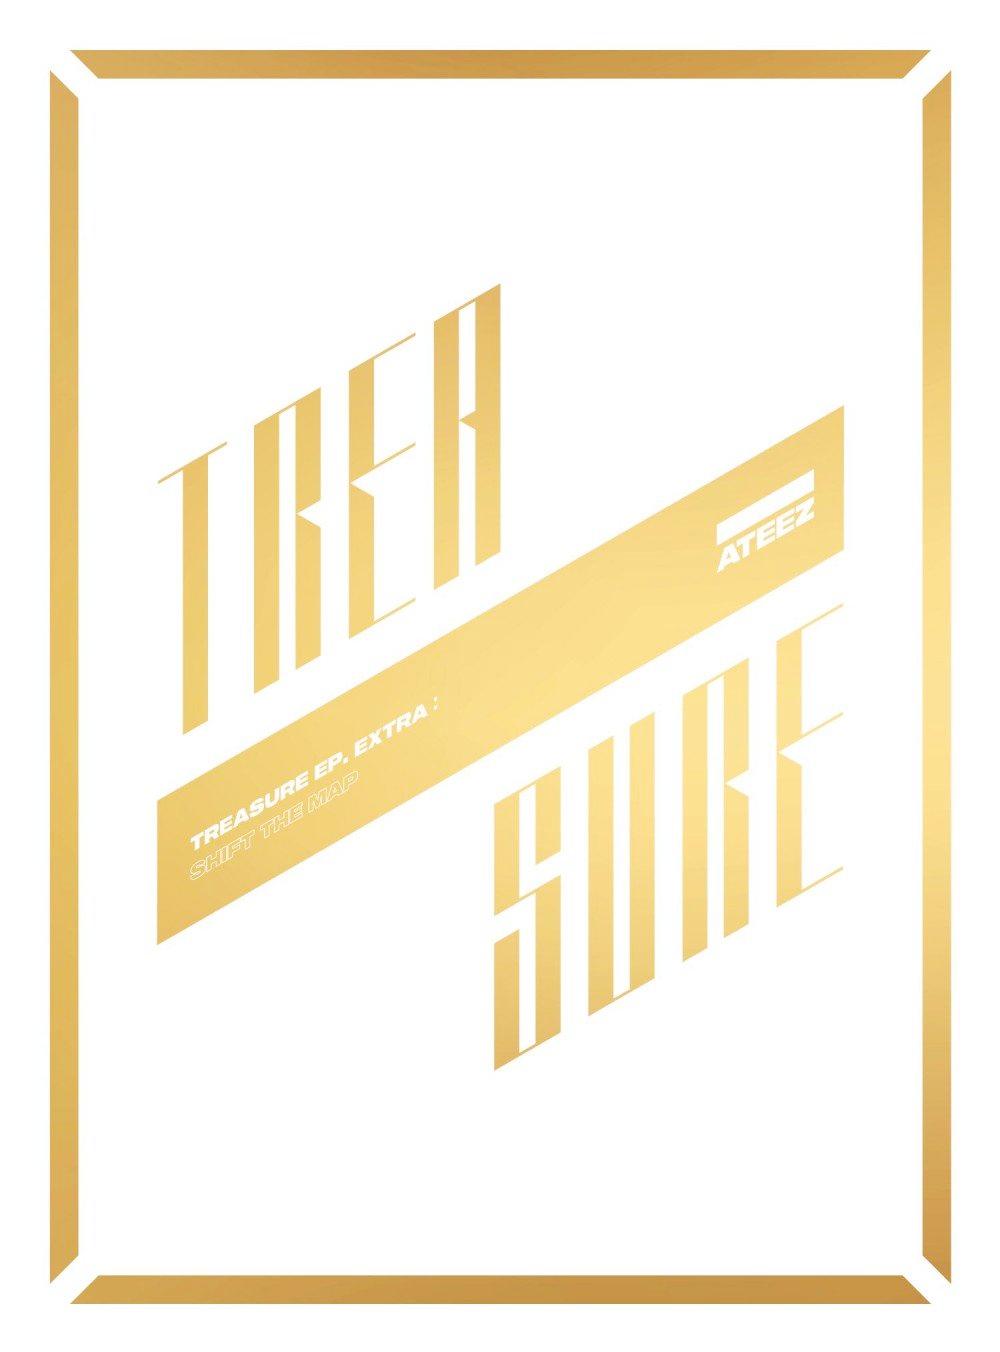 Treasure EP.Extra : Shift The Map